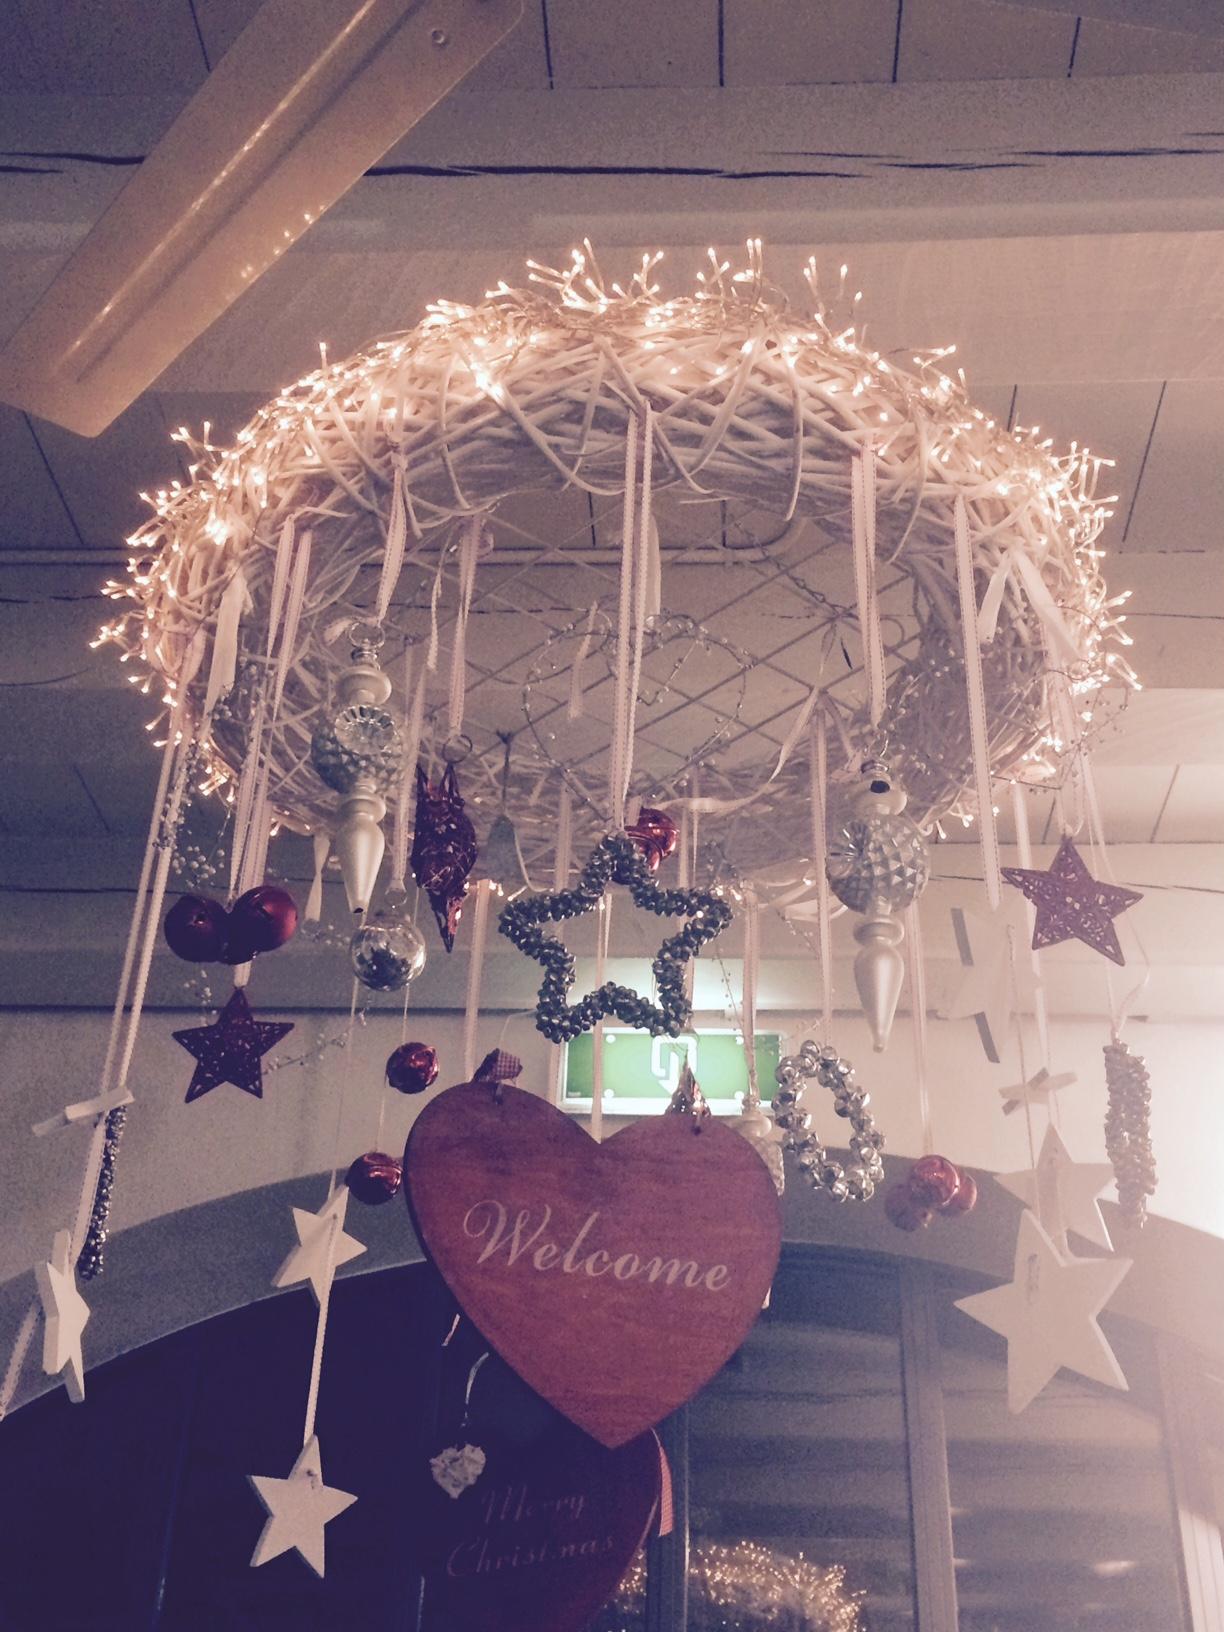 Doetinchem EspressoHouse in kerstsfeer